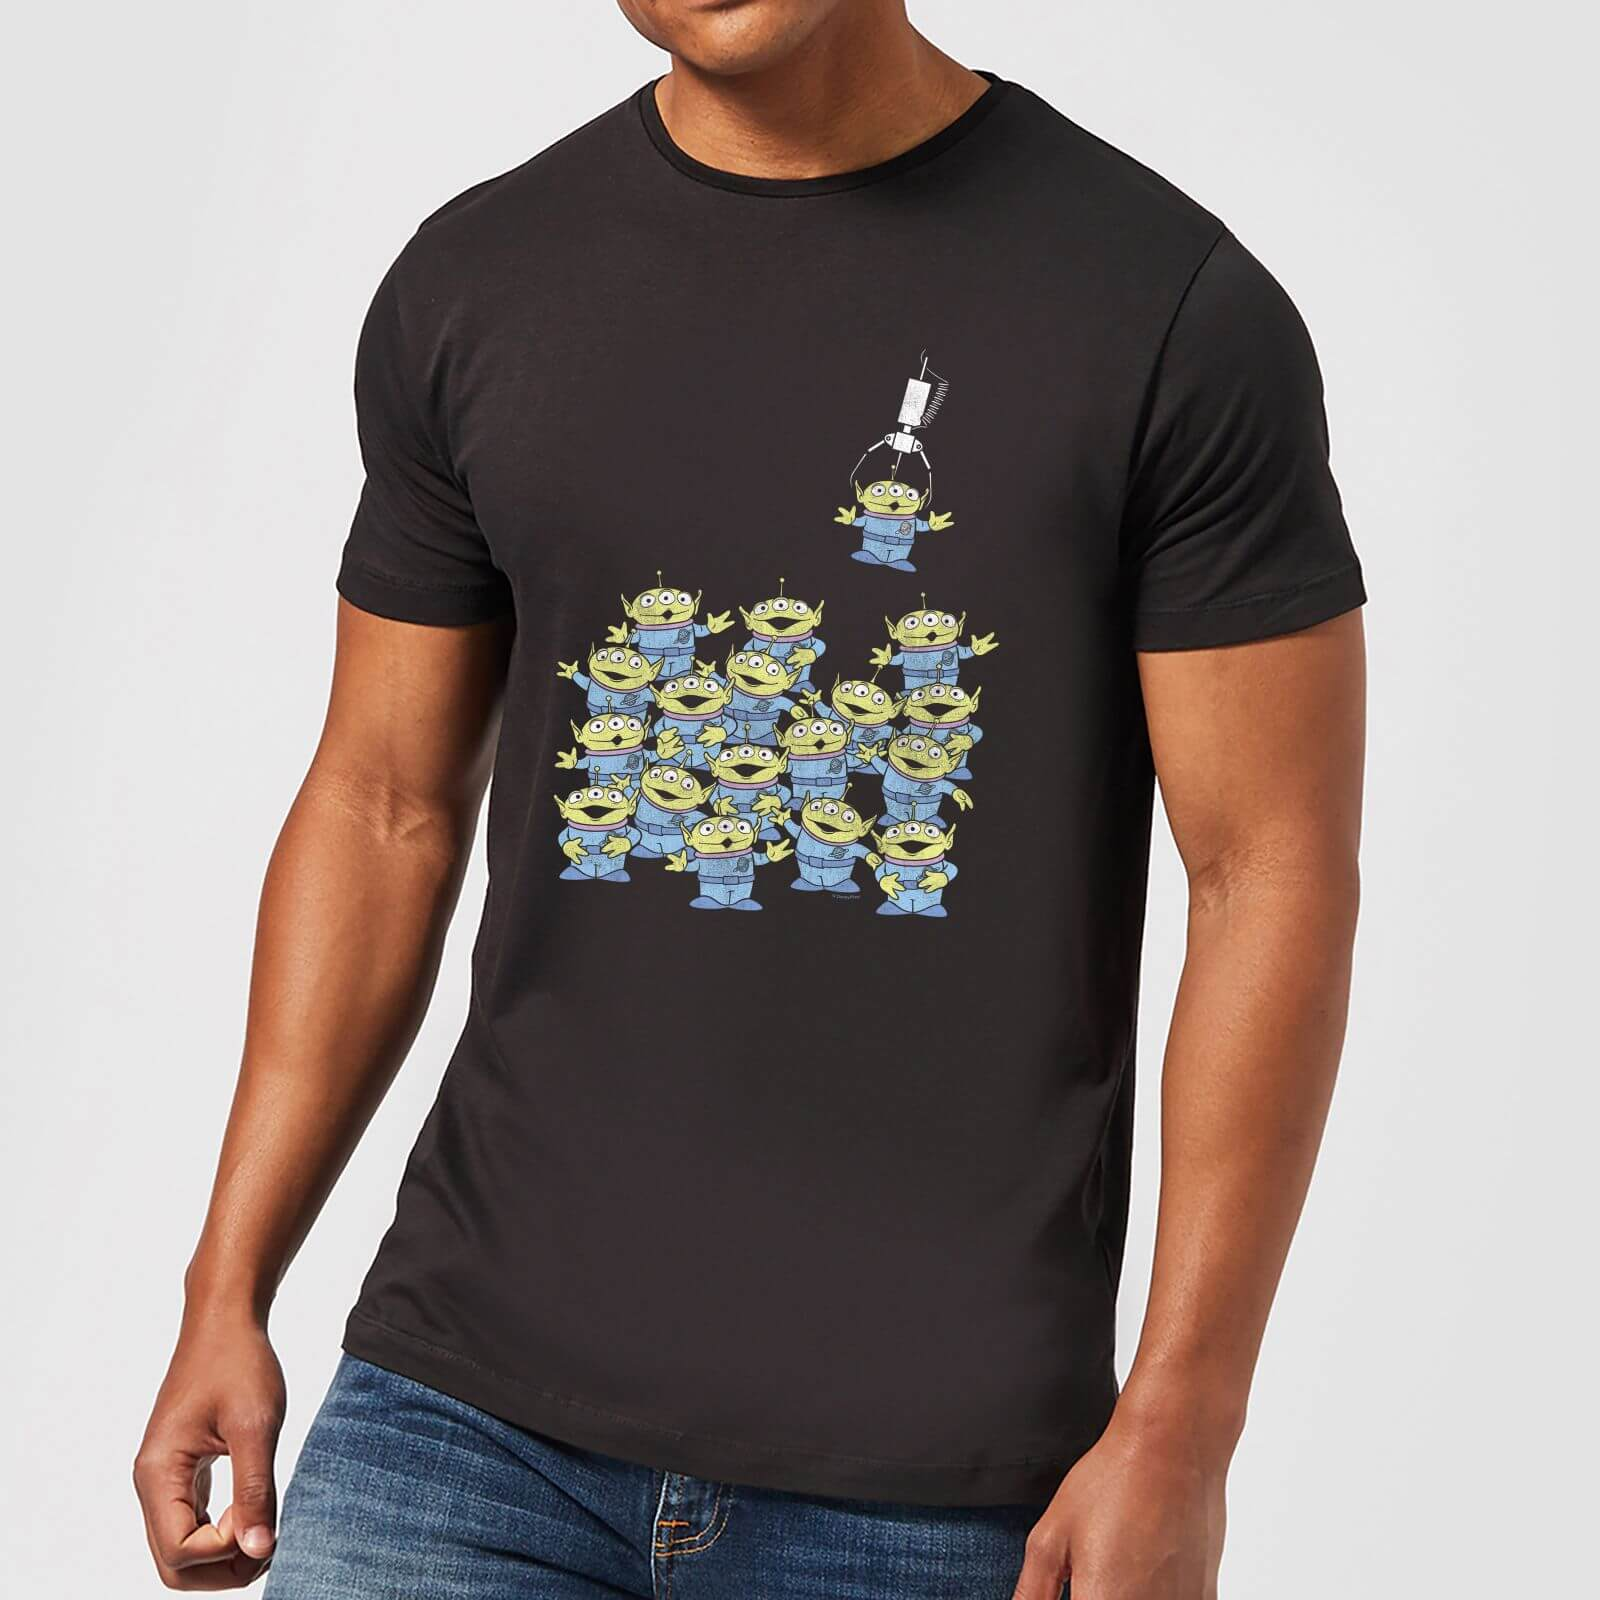 177adefbf36cd8 Toy Story The Claw Men's T-Shirt - Black Clothing   Zavvi